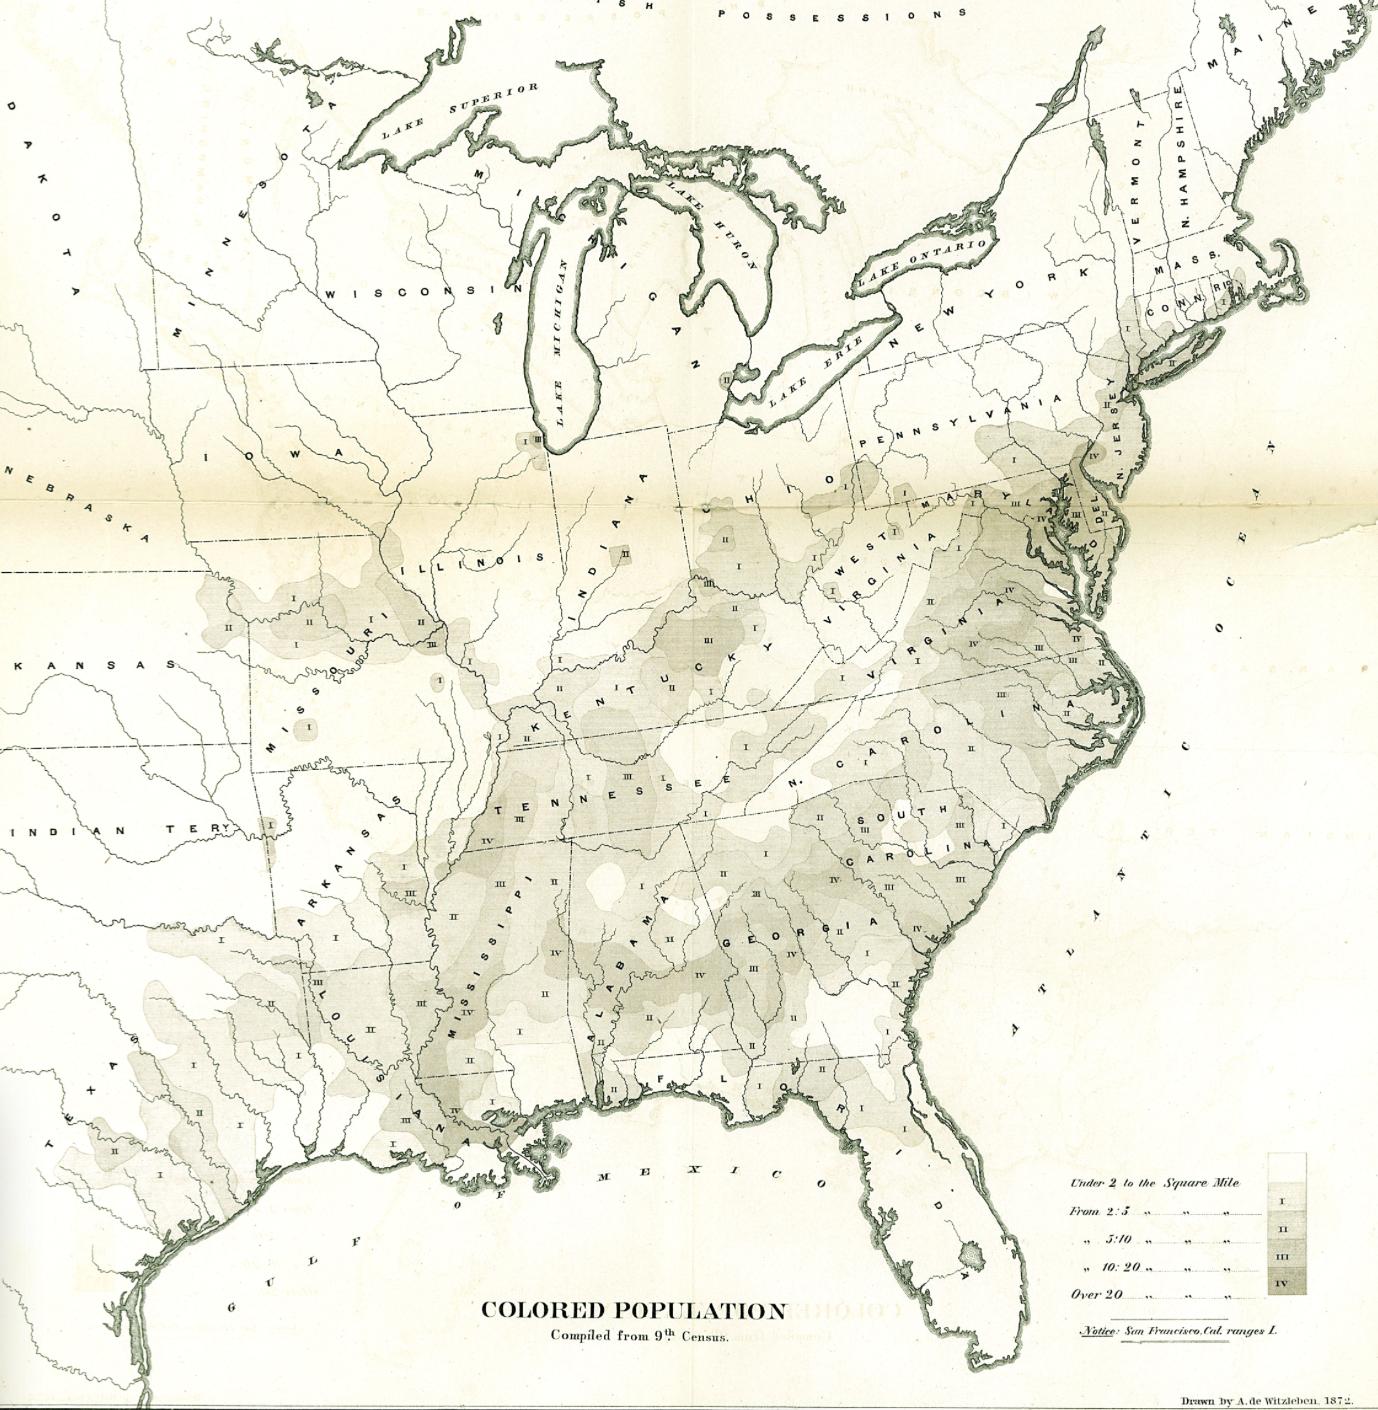 Colored Population 1872